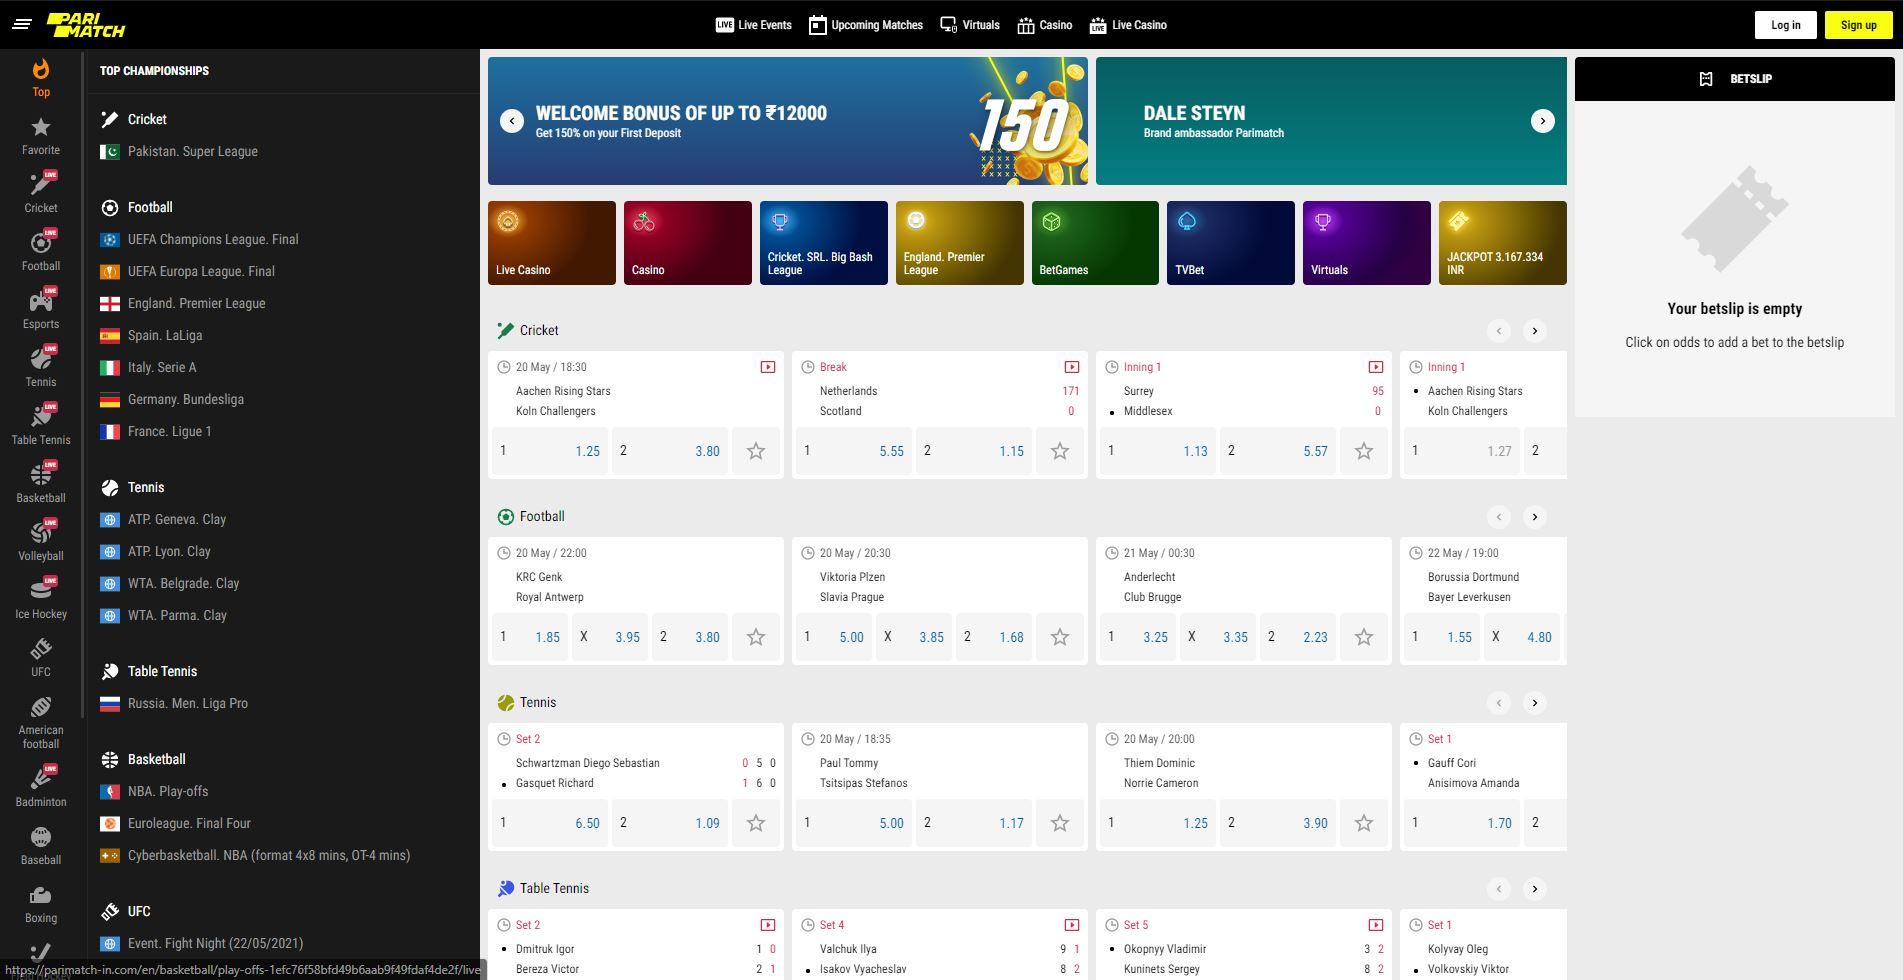 Parimatch Online Sportsbook Review